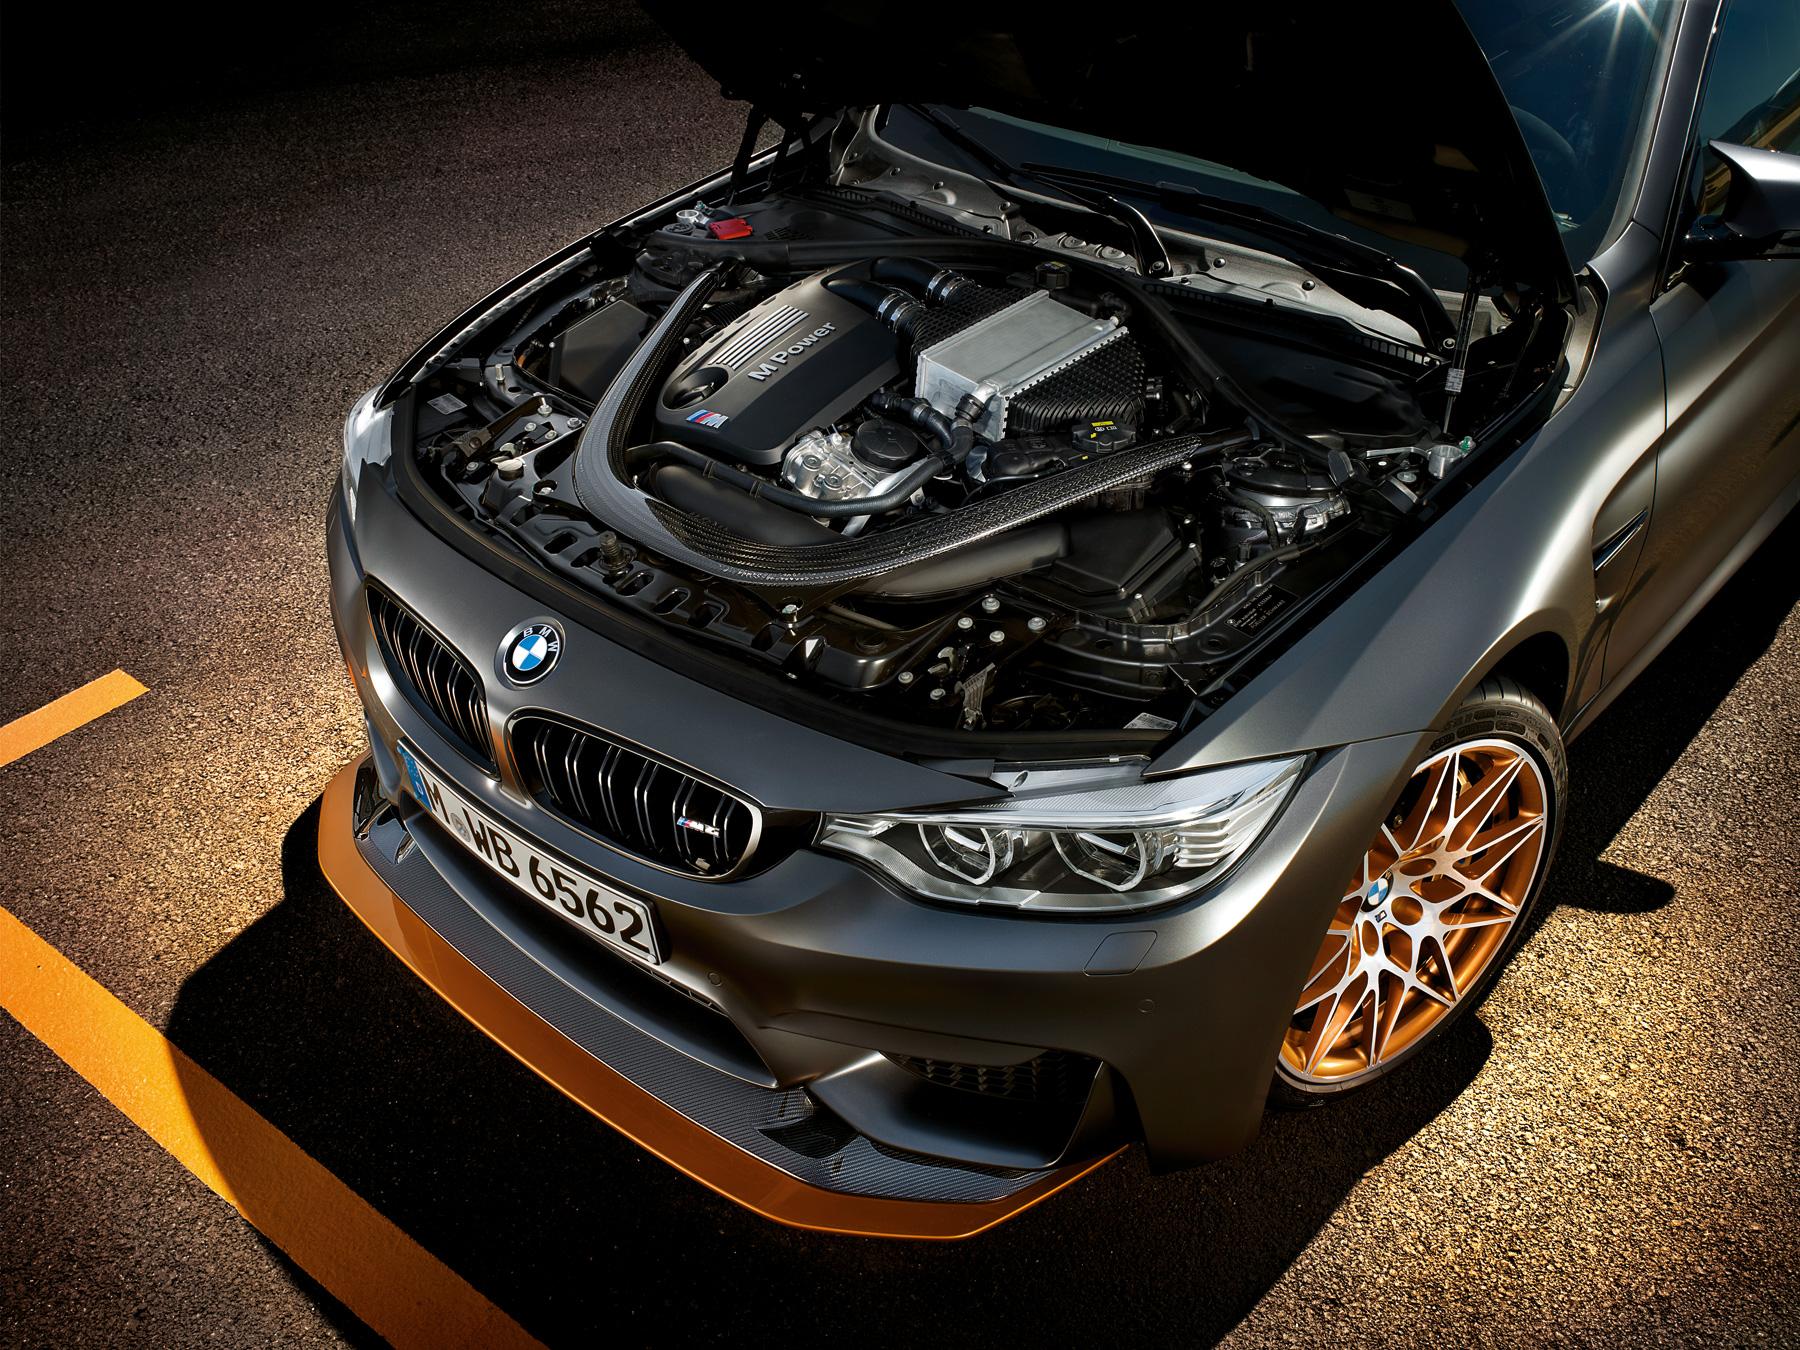 Norman Reuter BMW M4 GTS